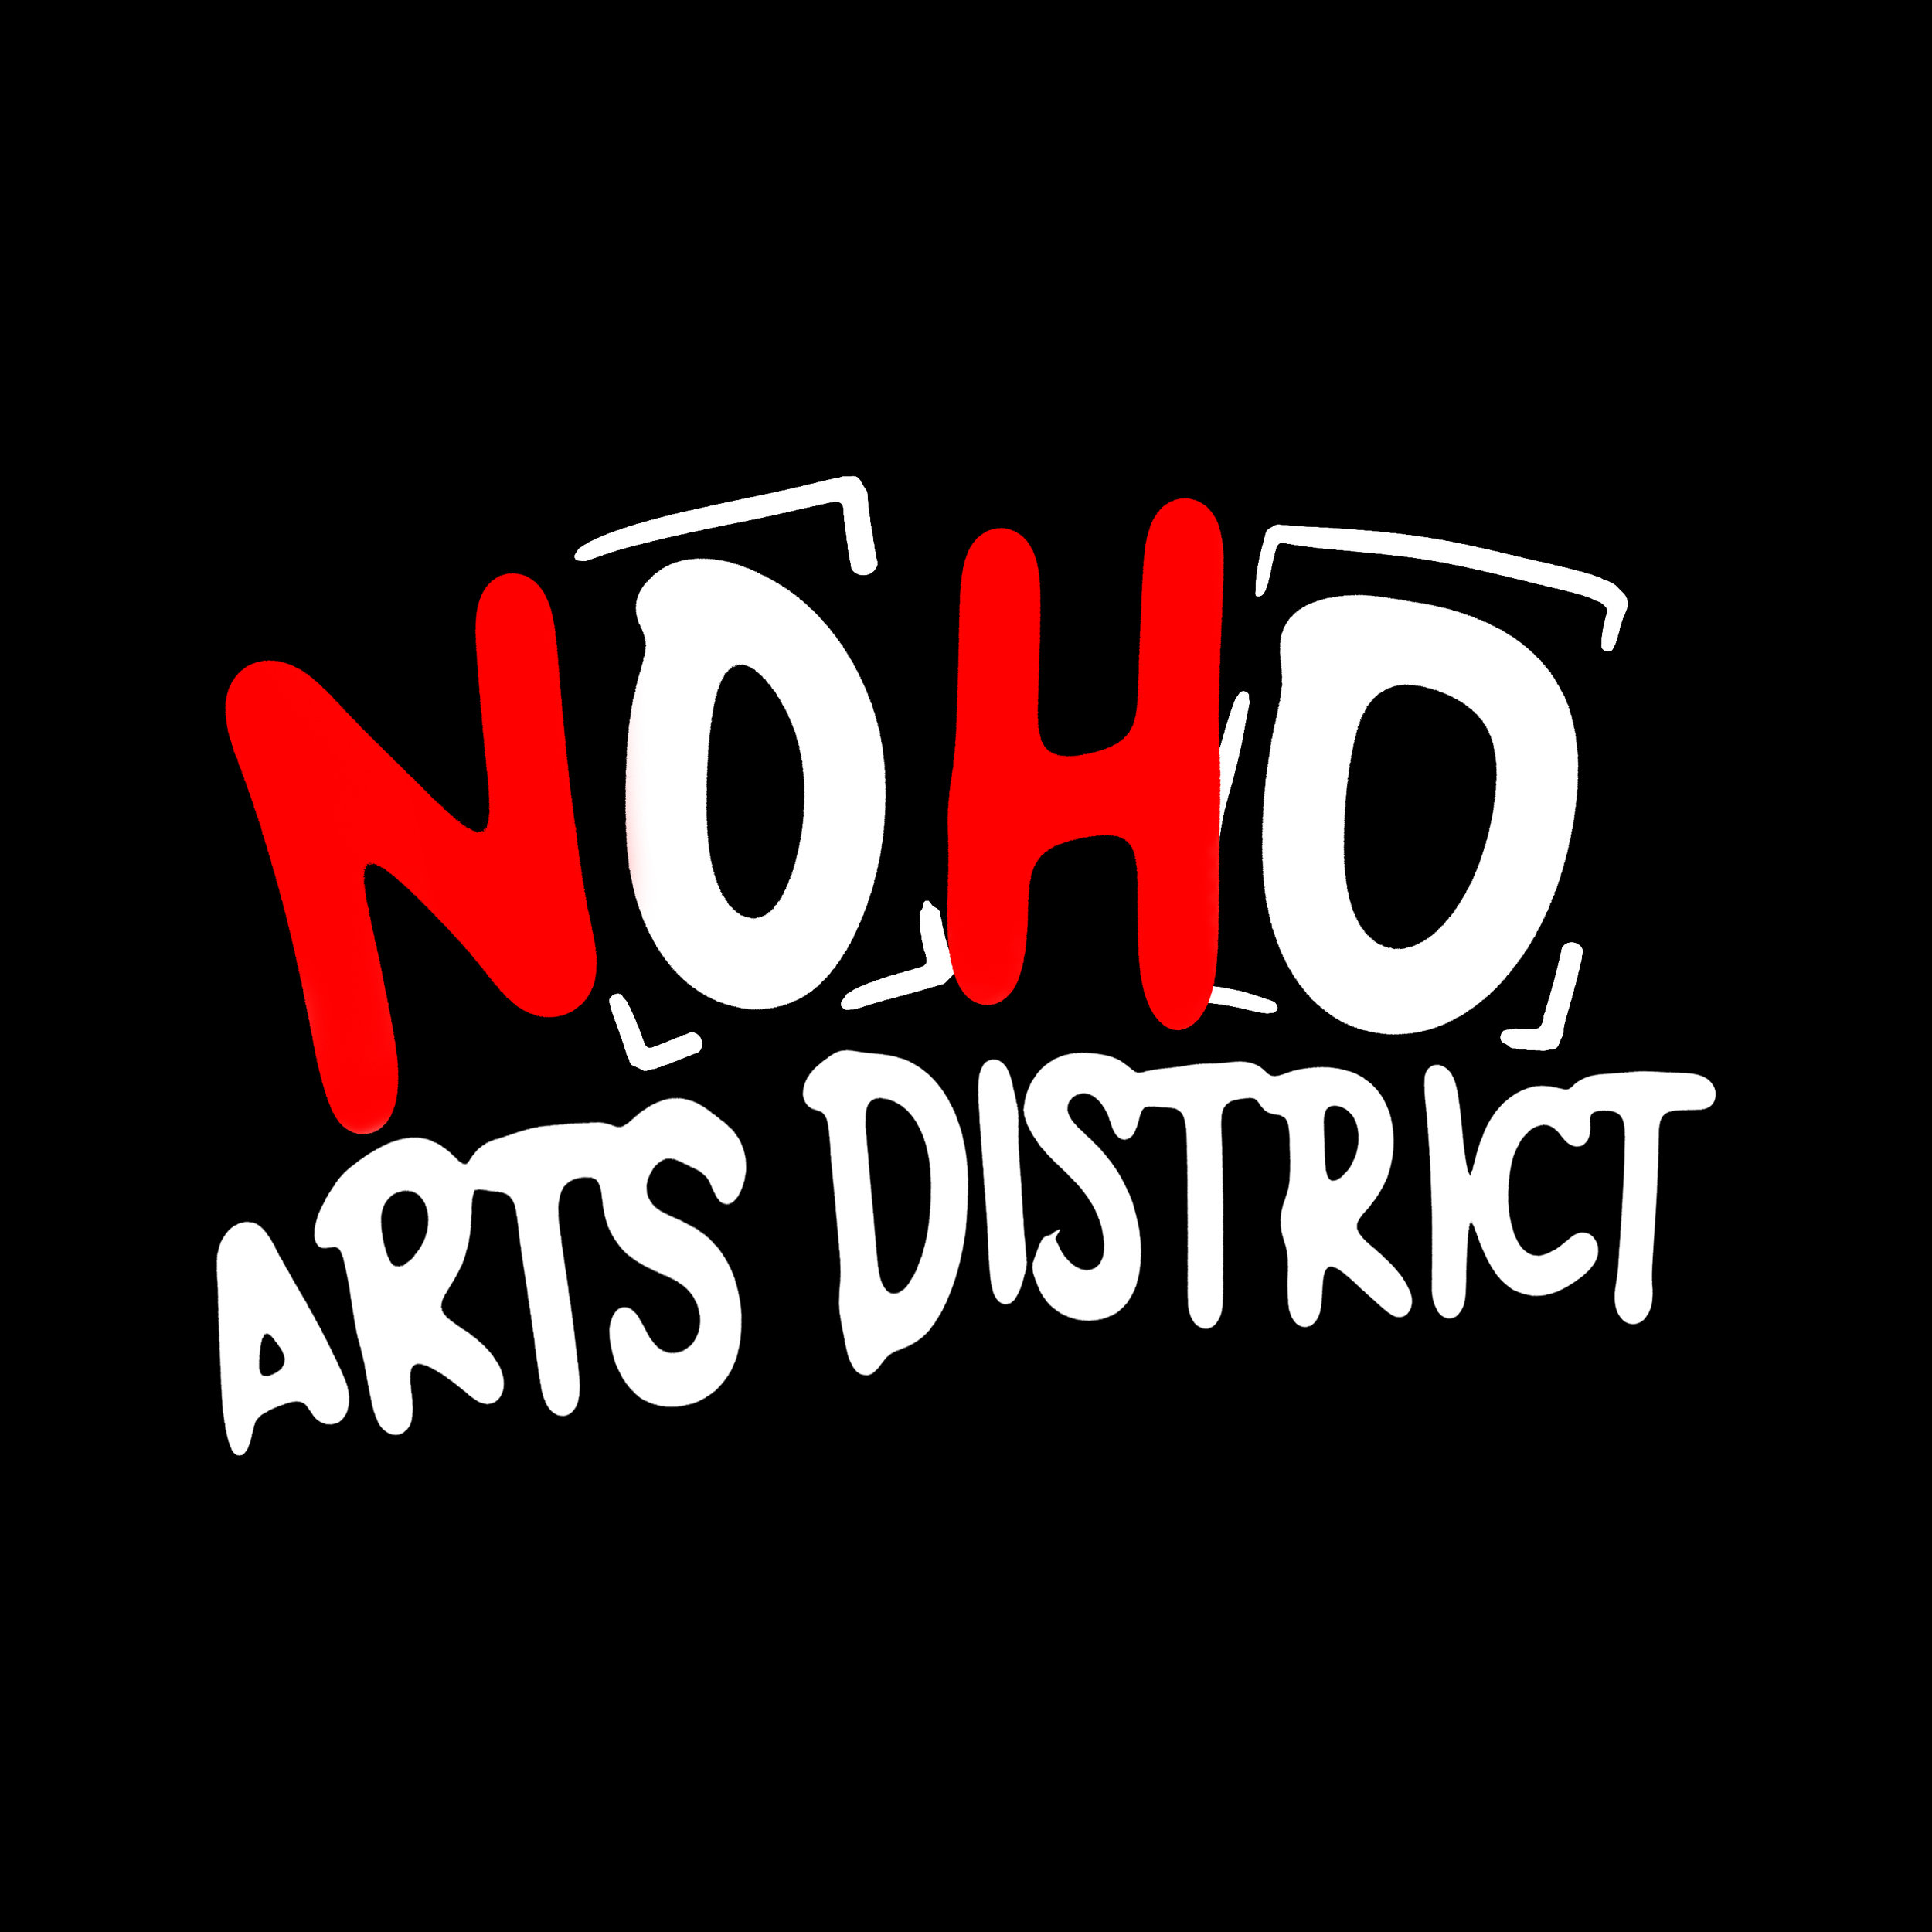 NOHO_ArtsDistrict_Snapchat_Filter_TDUB951_2016_Logo.jpg